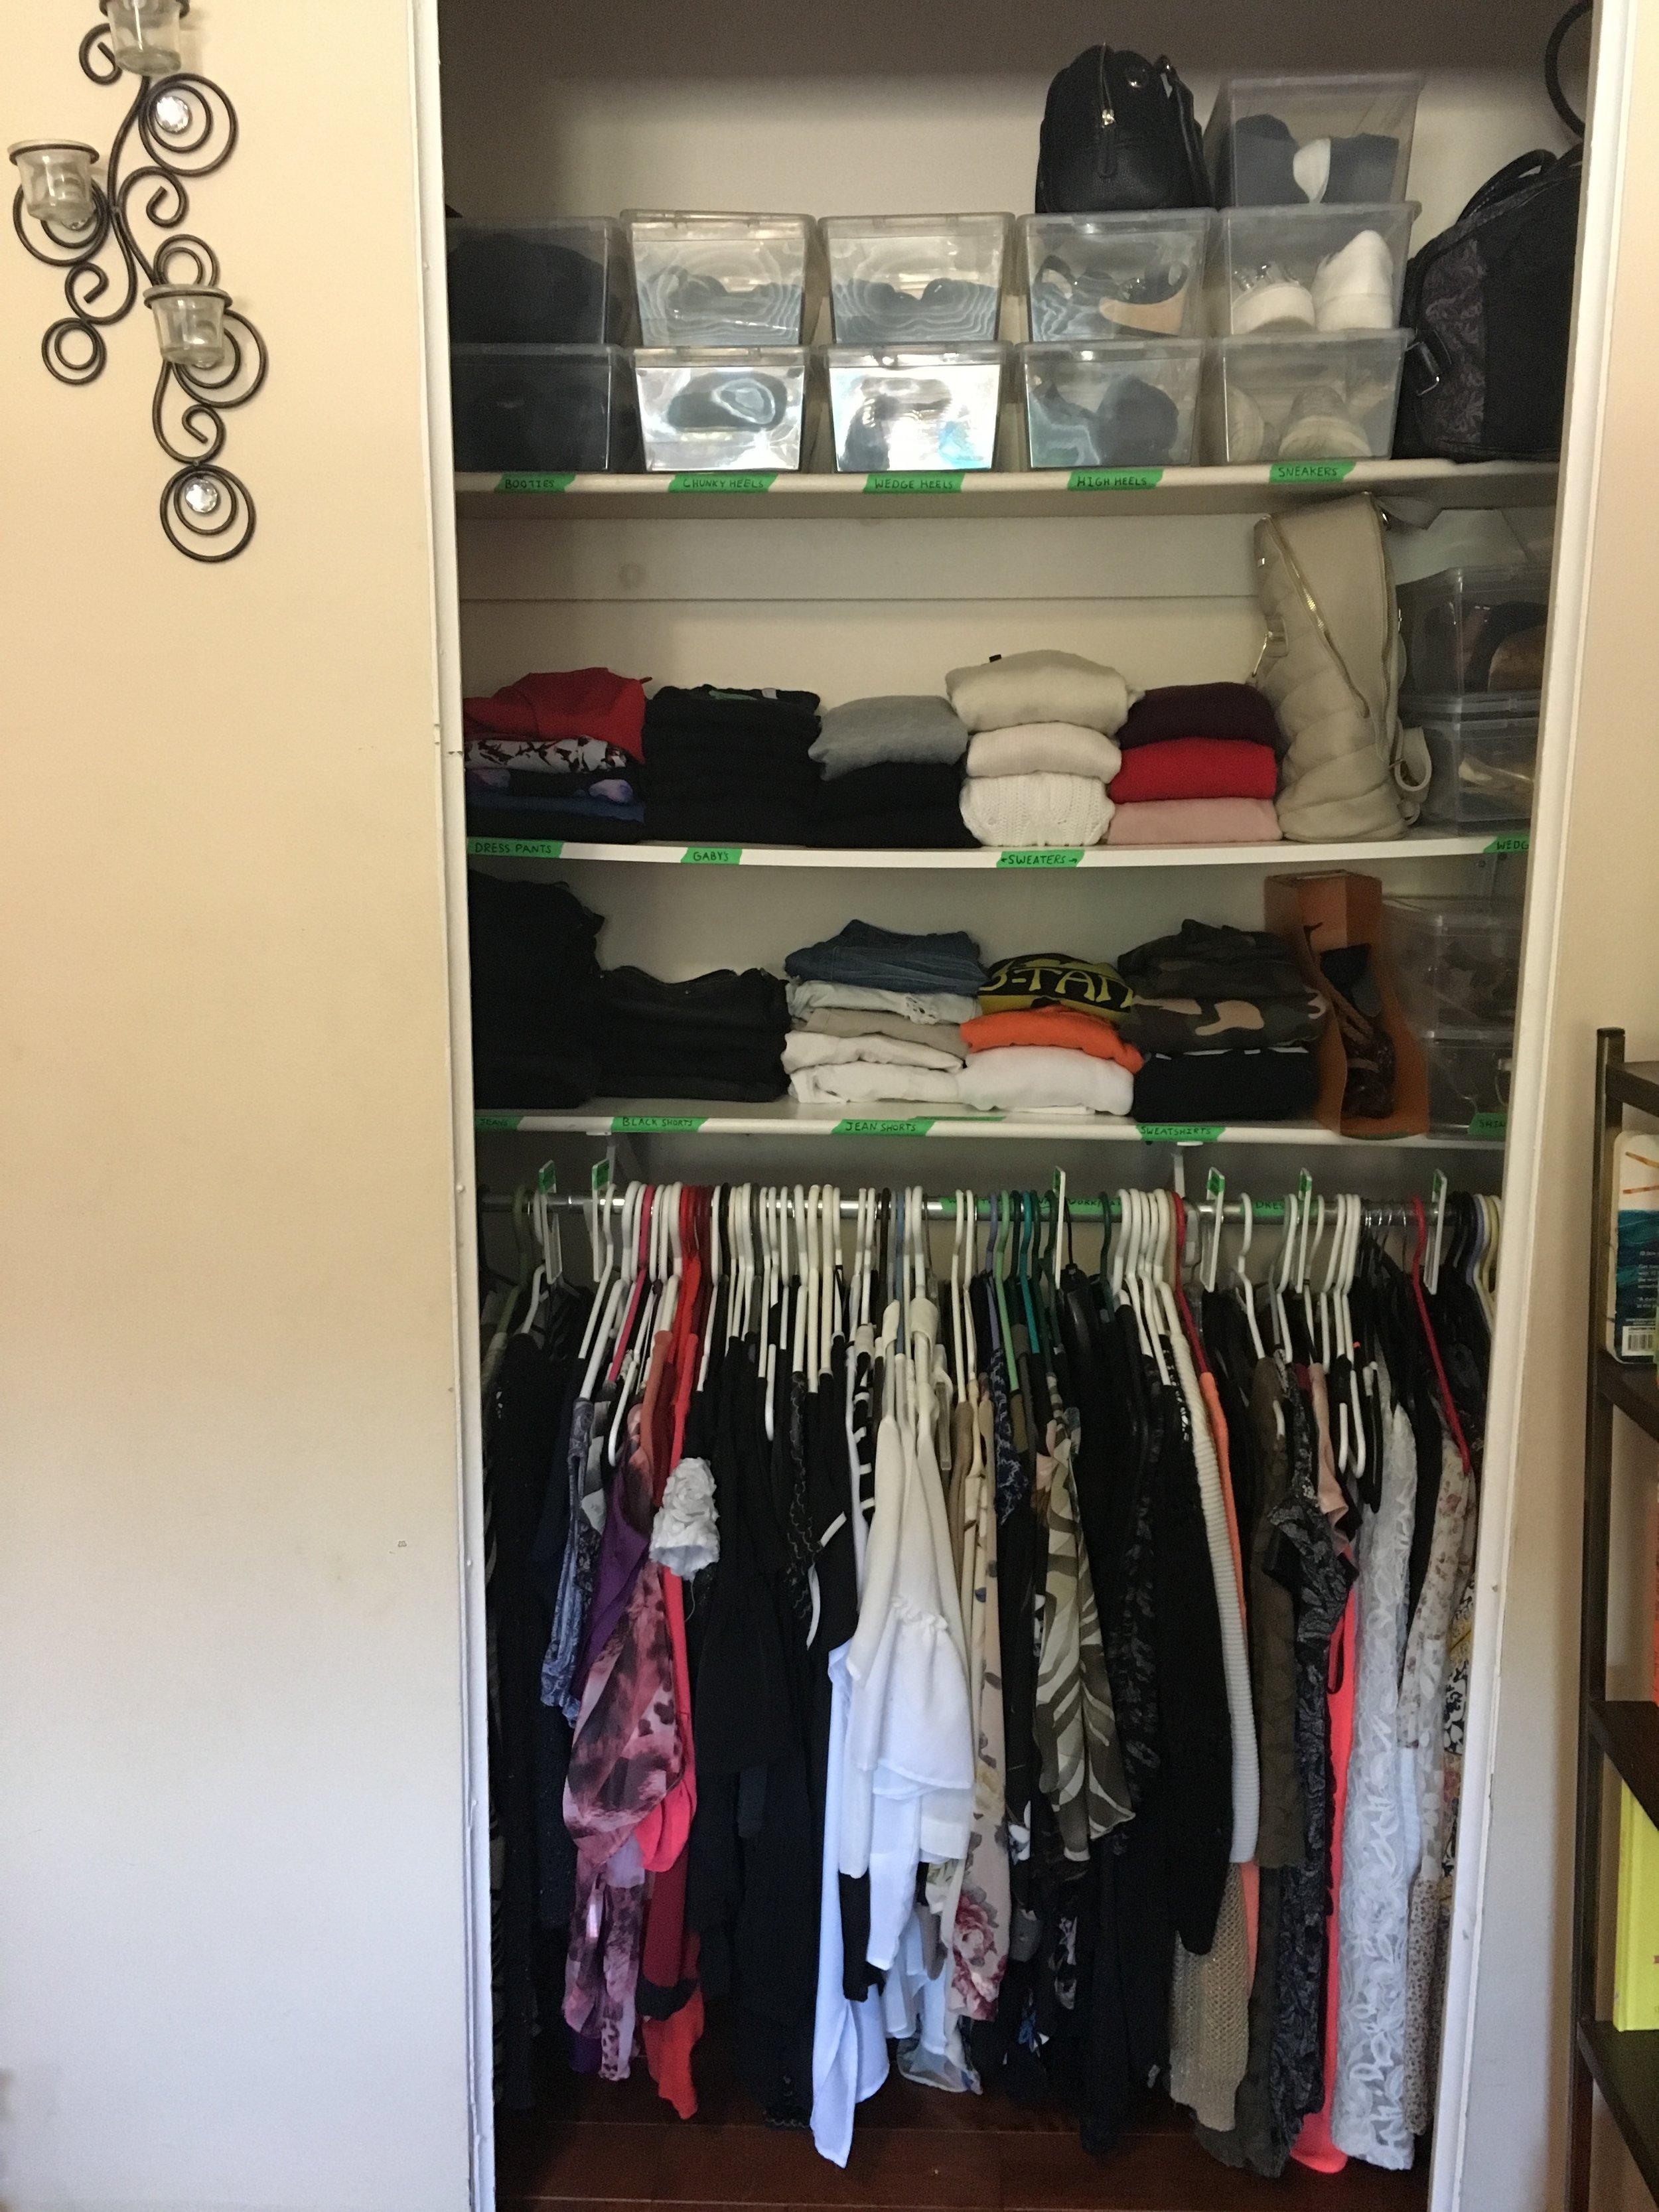 Closet 1: After / In-Progress